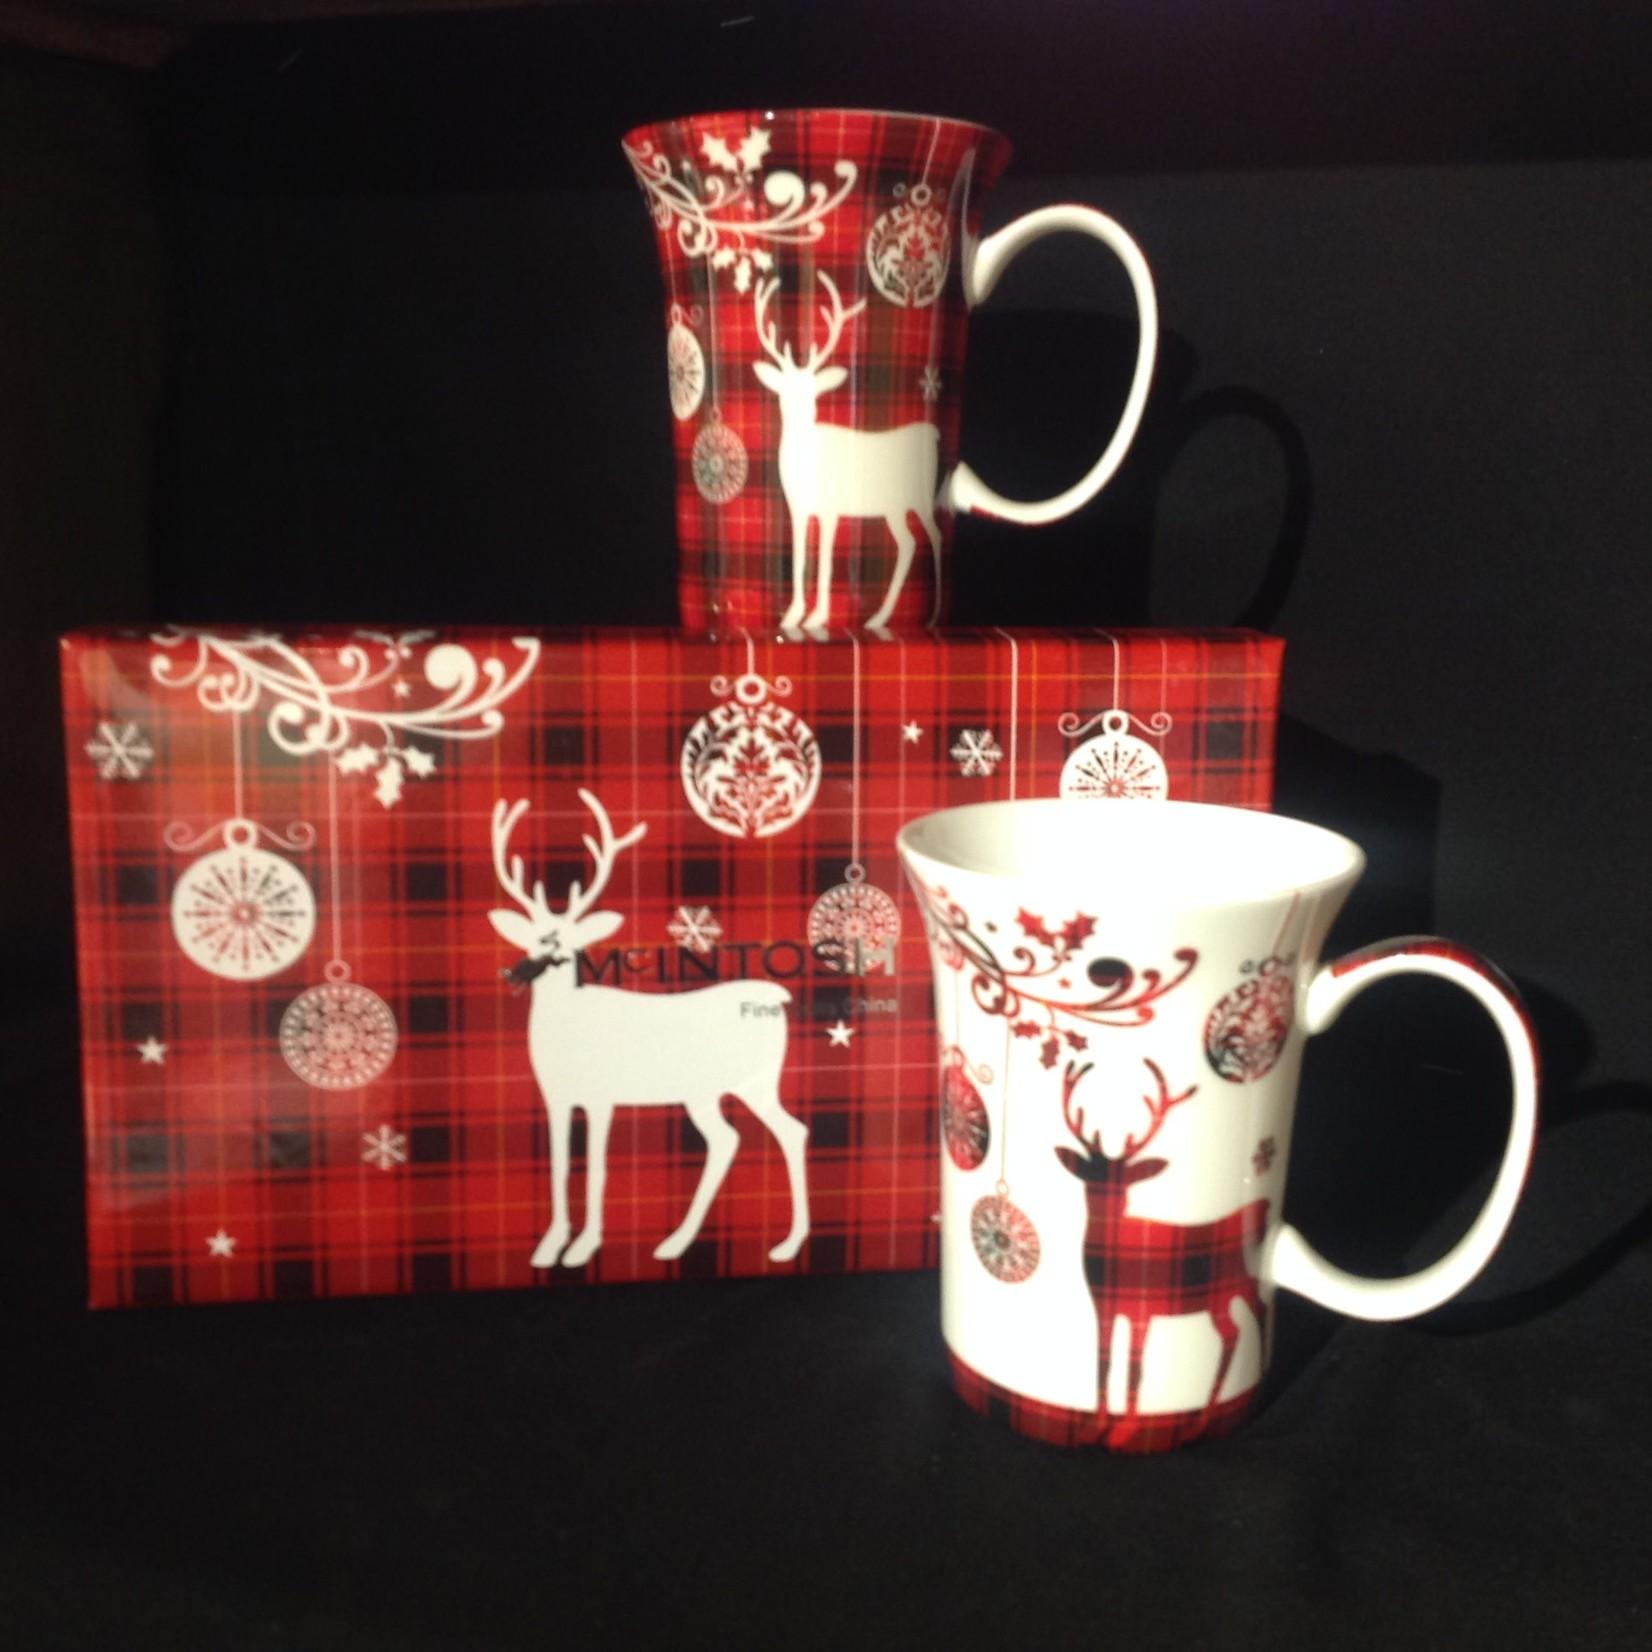 Holiday Reindeer Mugs (Set of 2)